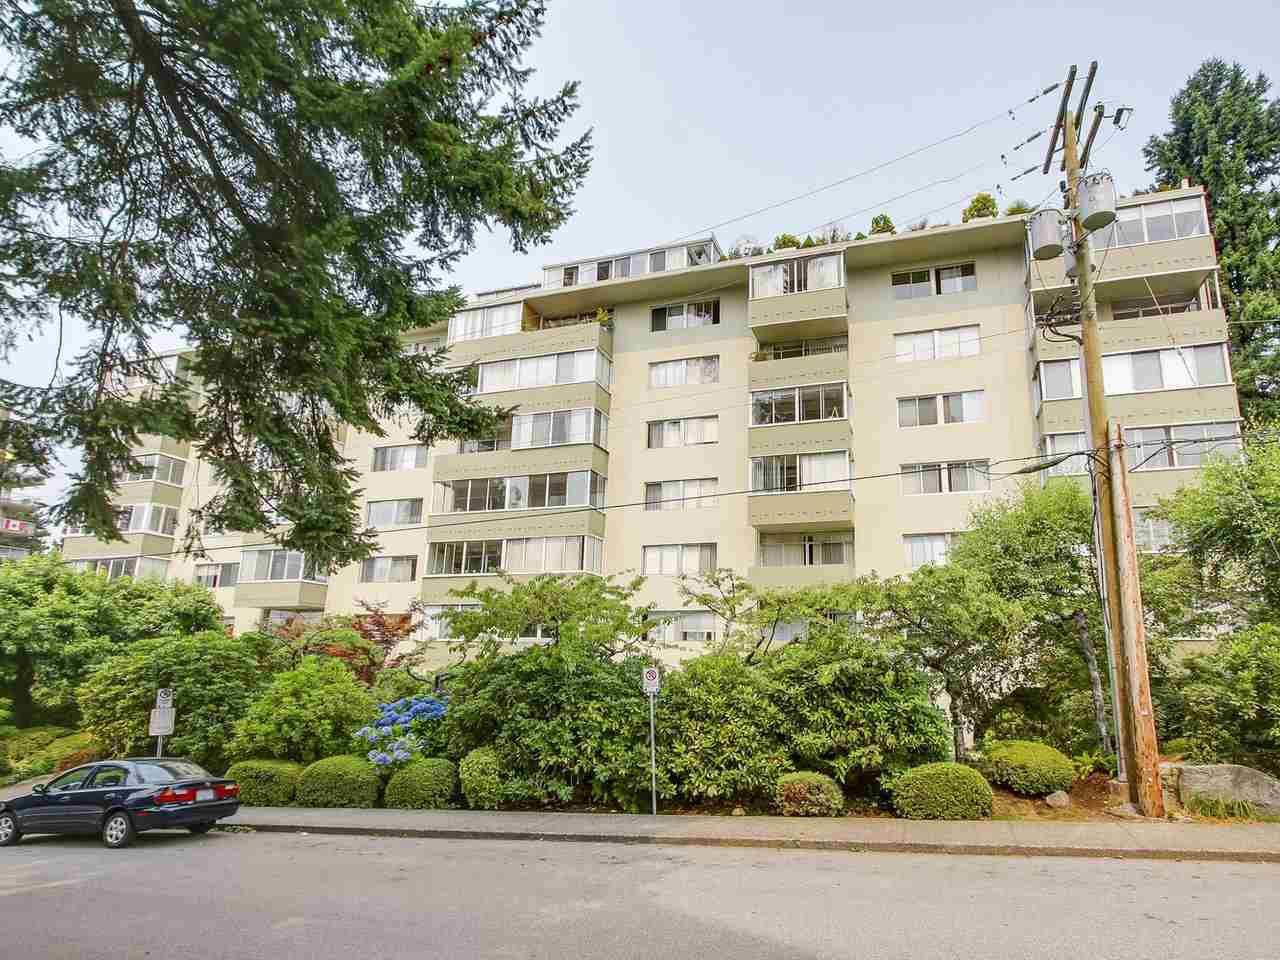 Main Photo: 606 1425 ESQUIMALT AVENUE in West Vancouver: Ambleside Condo for sale : MLS®# R2194722